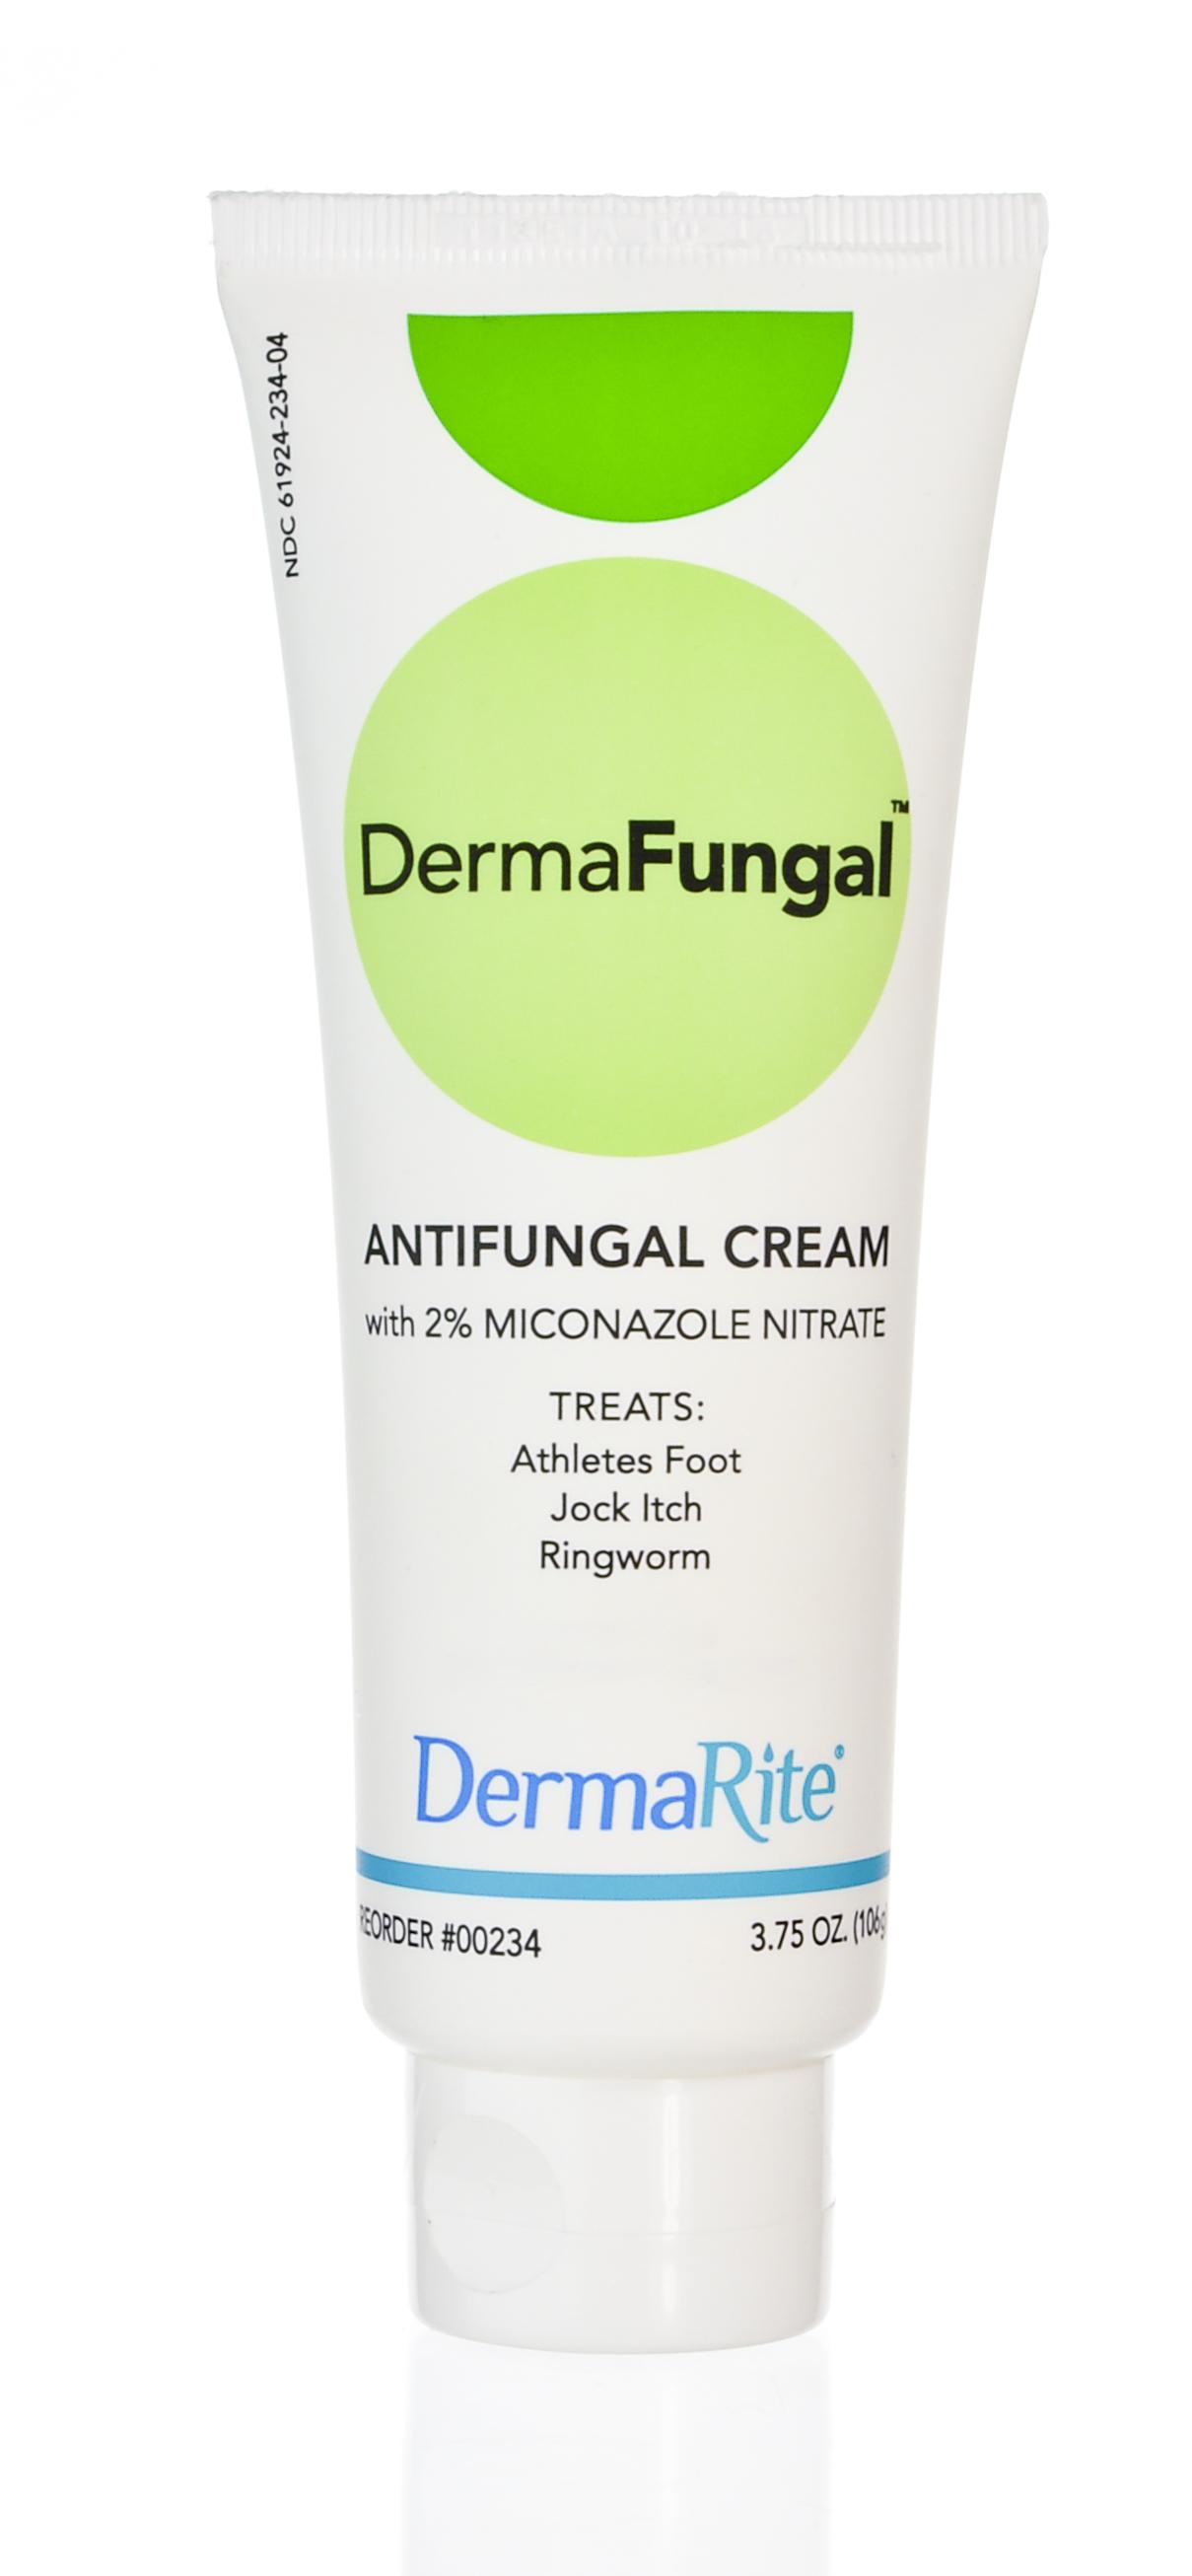 DermaFungal 2% Strength Antifungal Cream, 3.75 oz. Tube